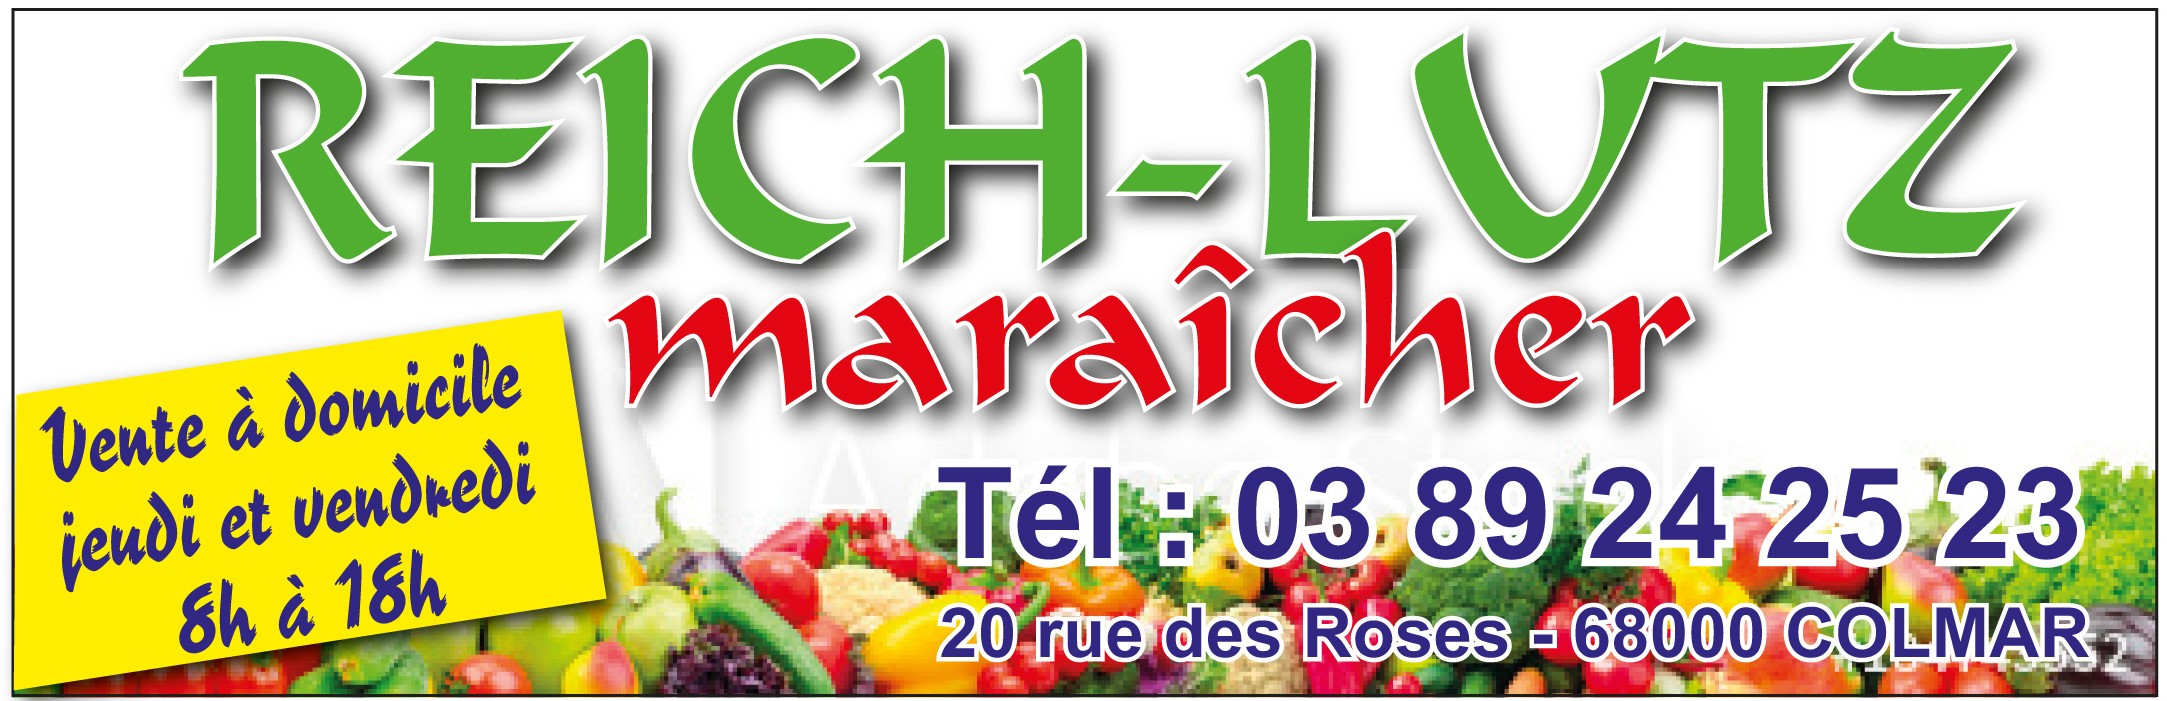 Panneau REICH-LUTZ Maraîcher